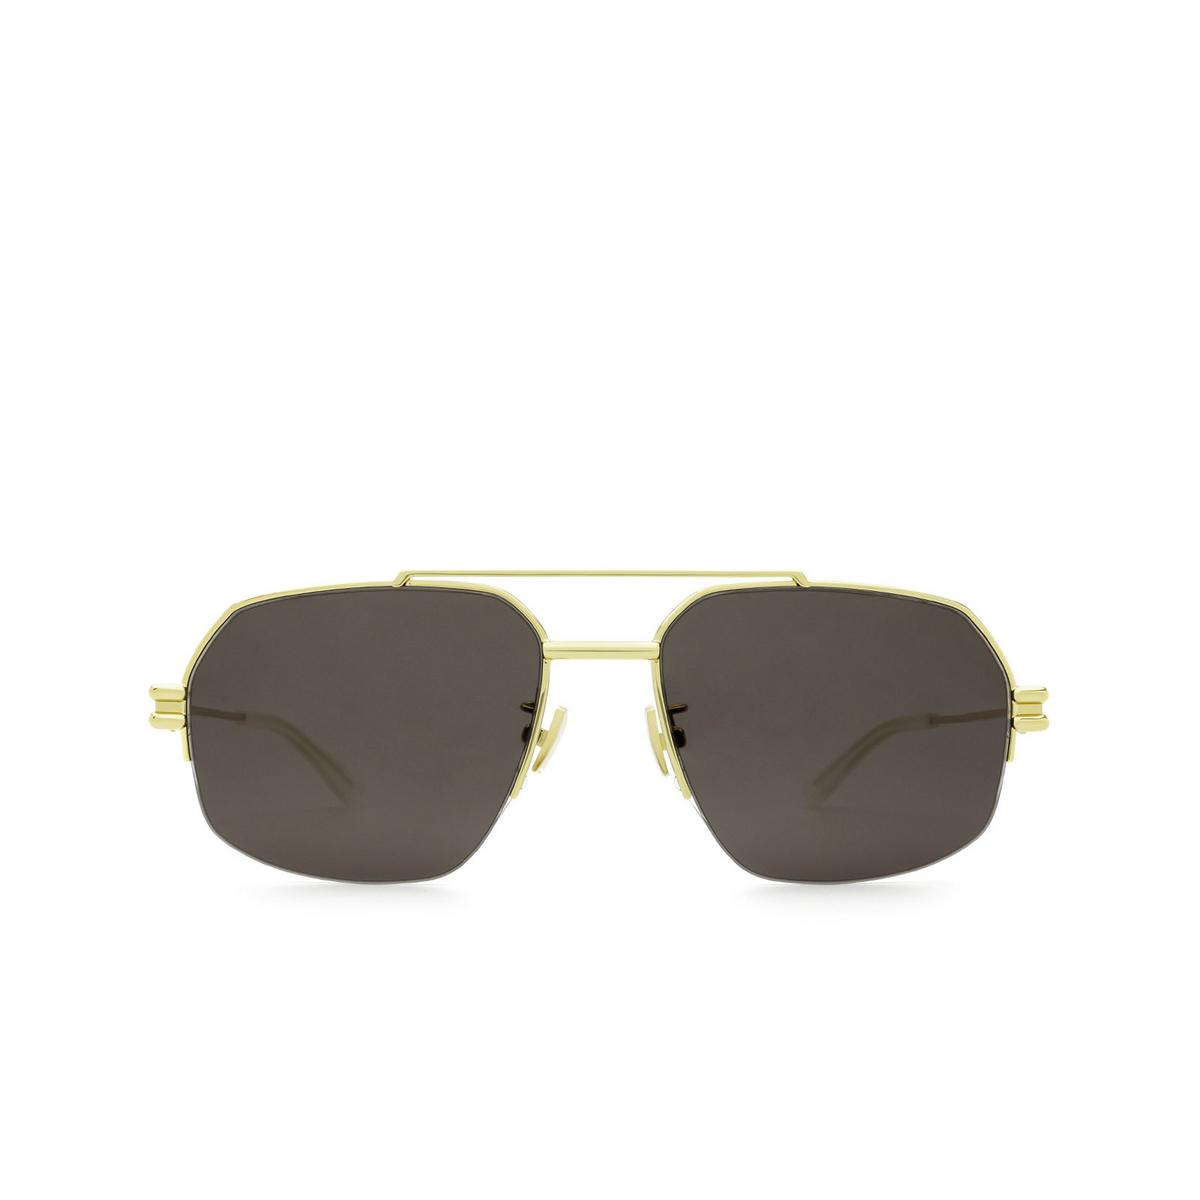 Bottega Veneta® Irregular Sunglasses: BV1127S color Gold 002 - front view.